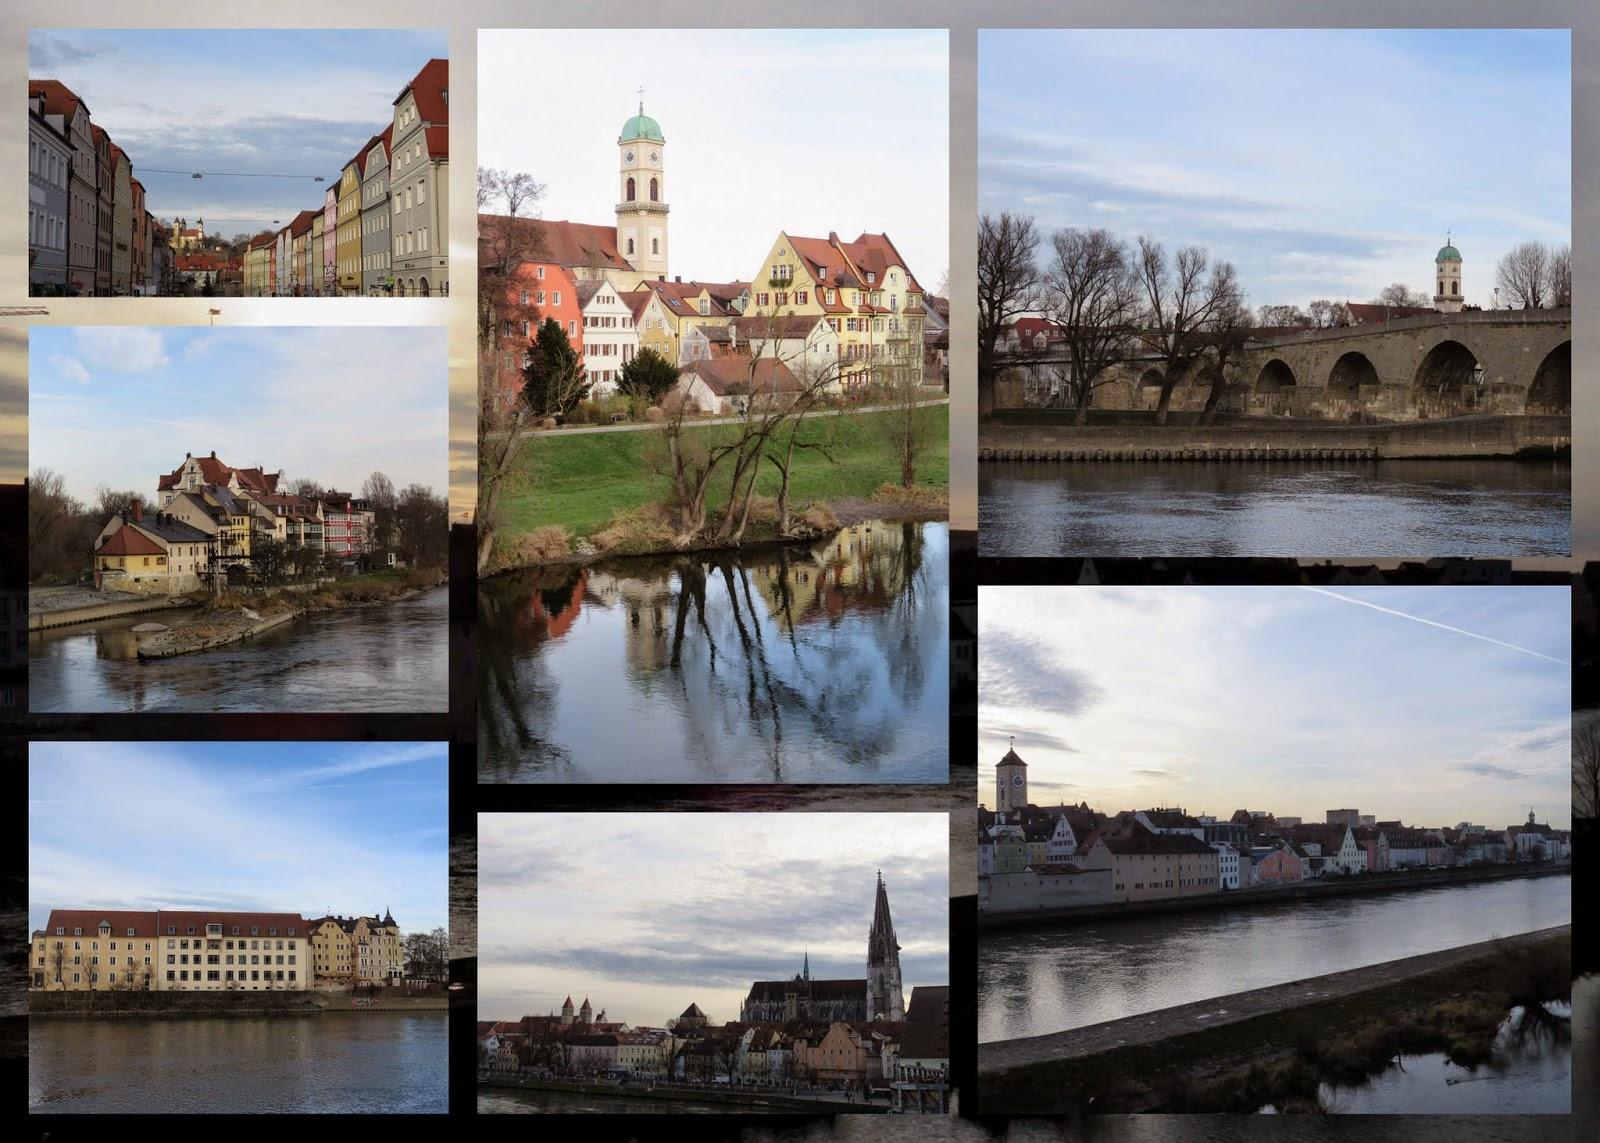 Regensburg - On the Danube